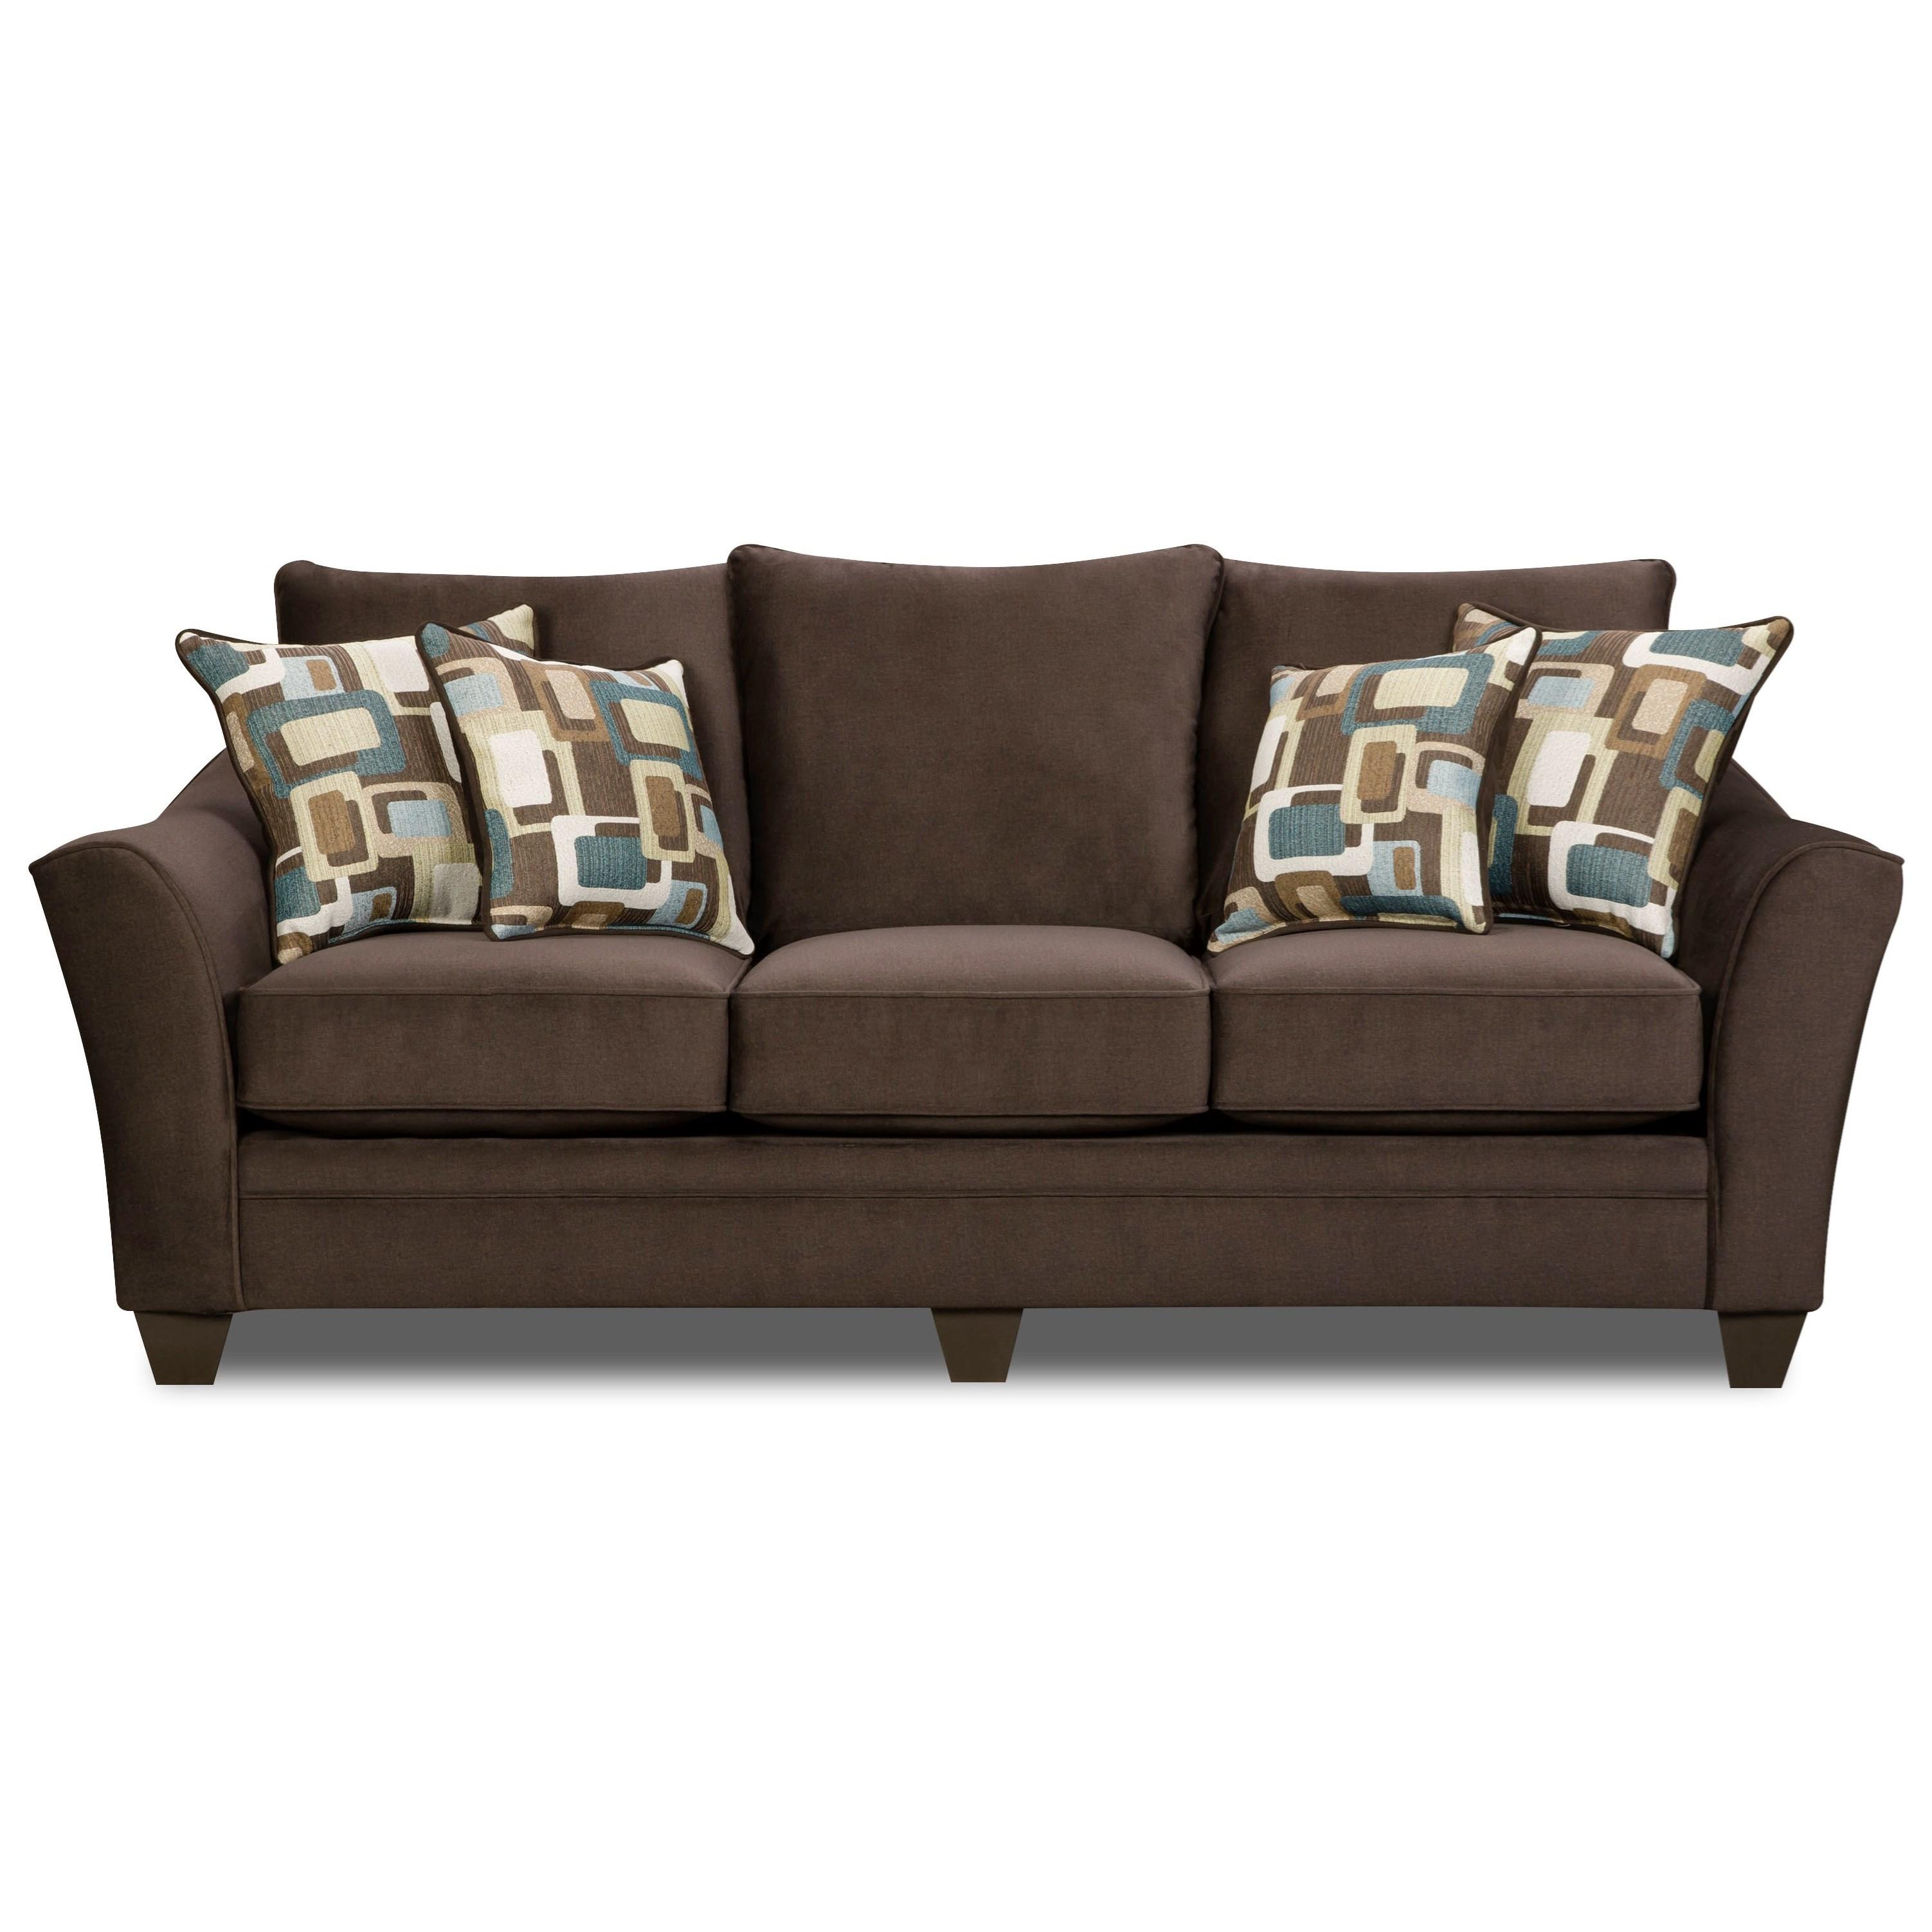 American Furniture 3850 Elegant Sofa With Contemporary